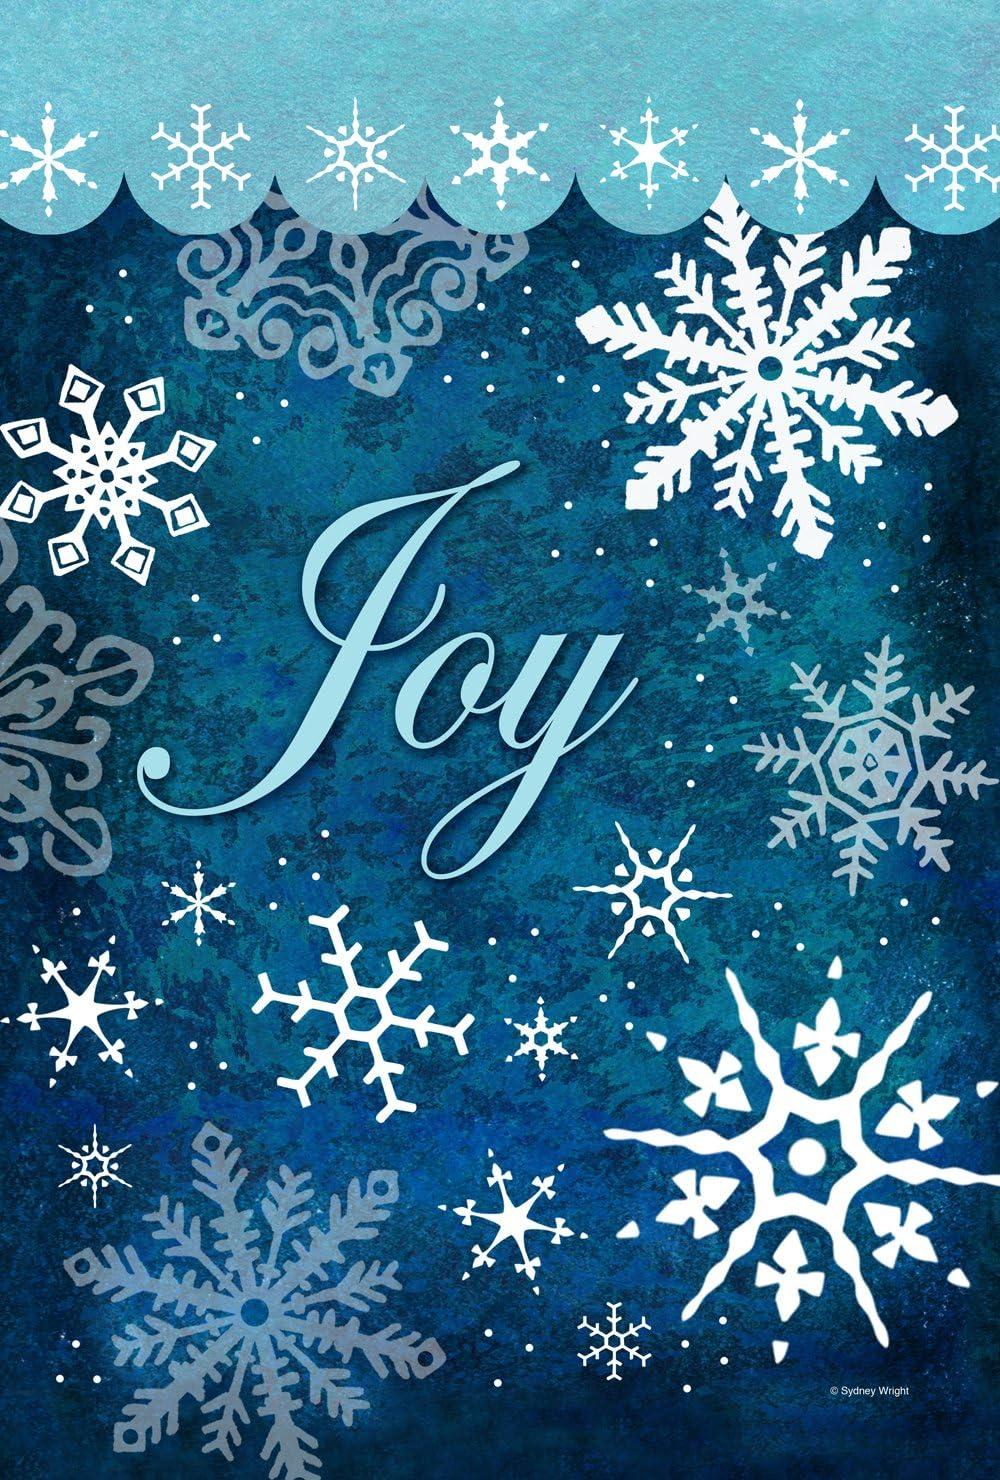 Toland Home Garden Snowflake Flurries 28 x 40 Inch Decorative Colorful Winter Joy Snow House Flag - 109734